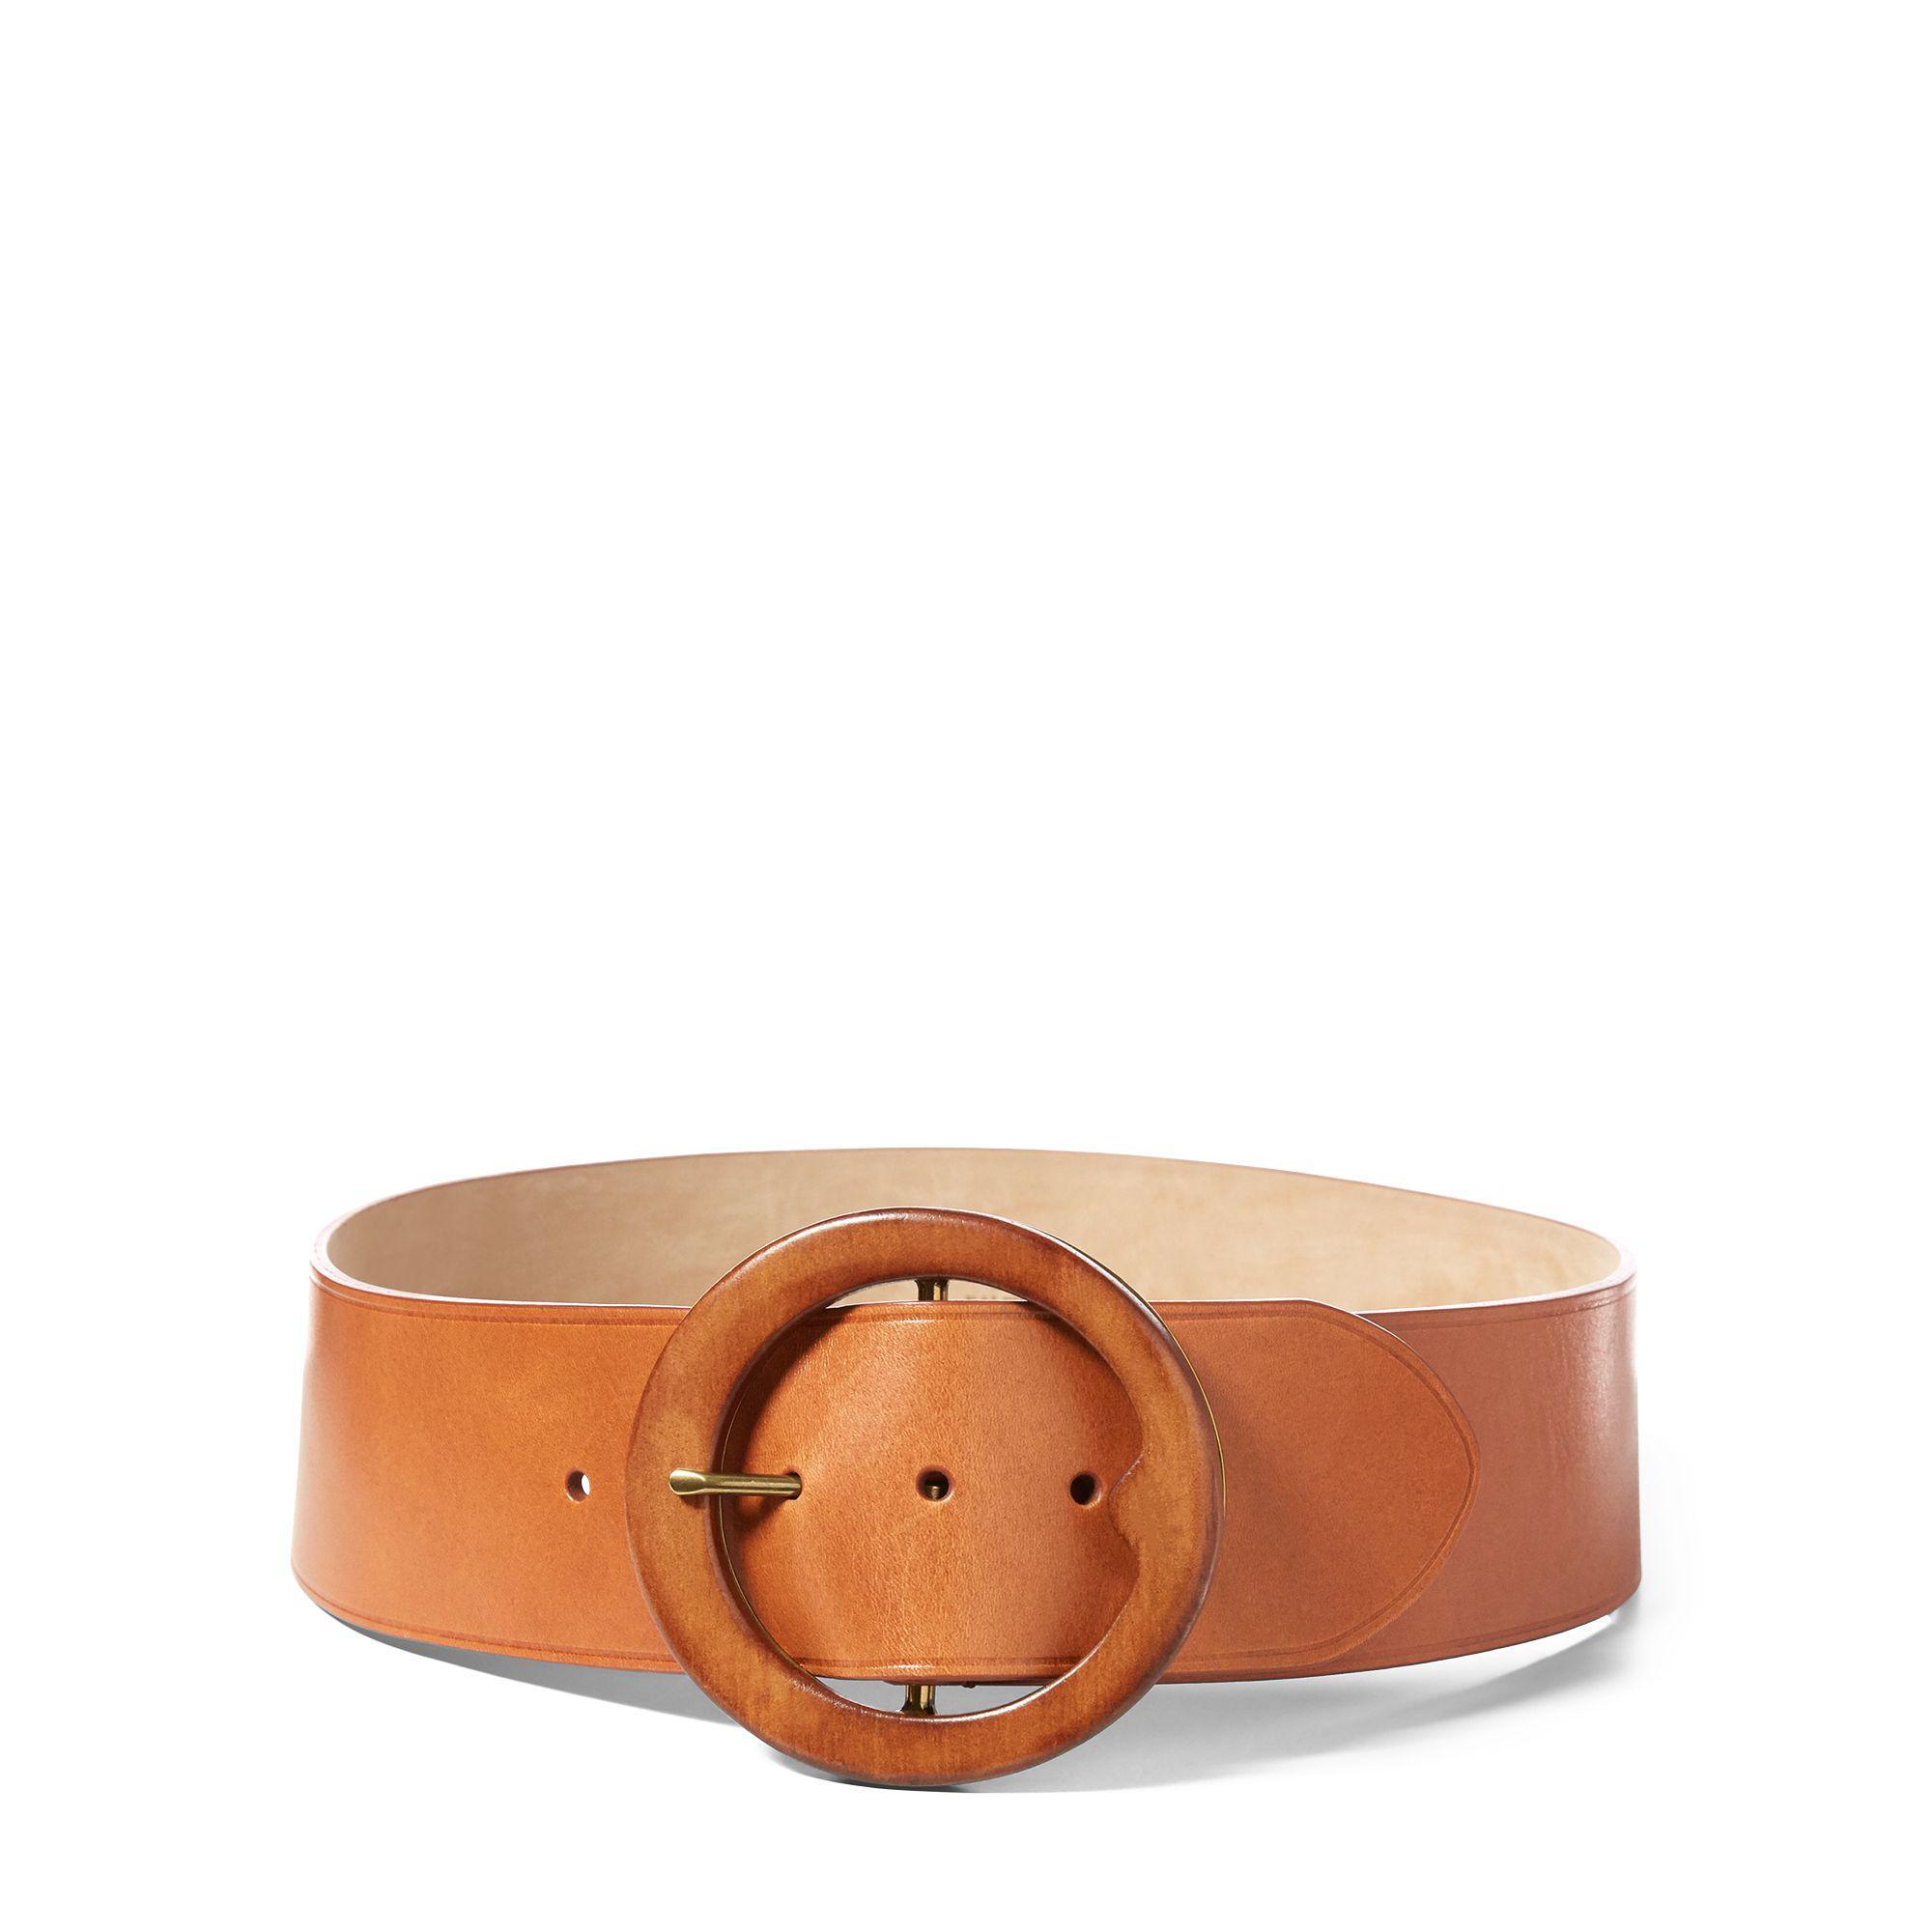 Polo Ralph Lauren Lennox Wood-buckle Belt in Brown - Lyst 43c4f0f0ad